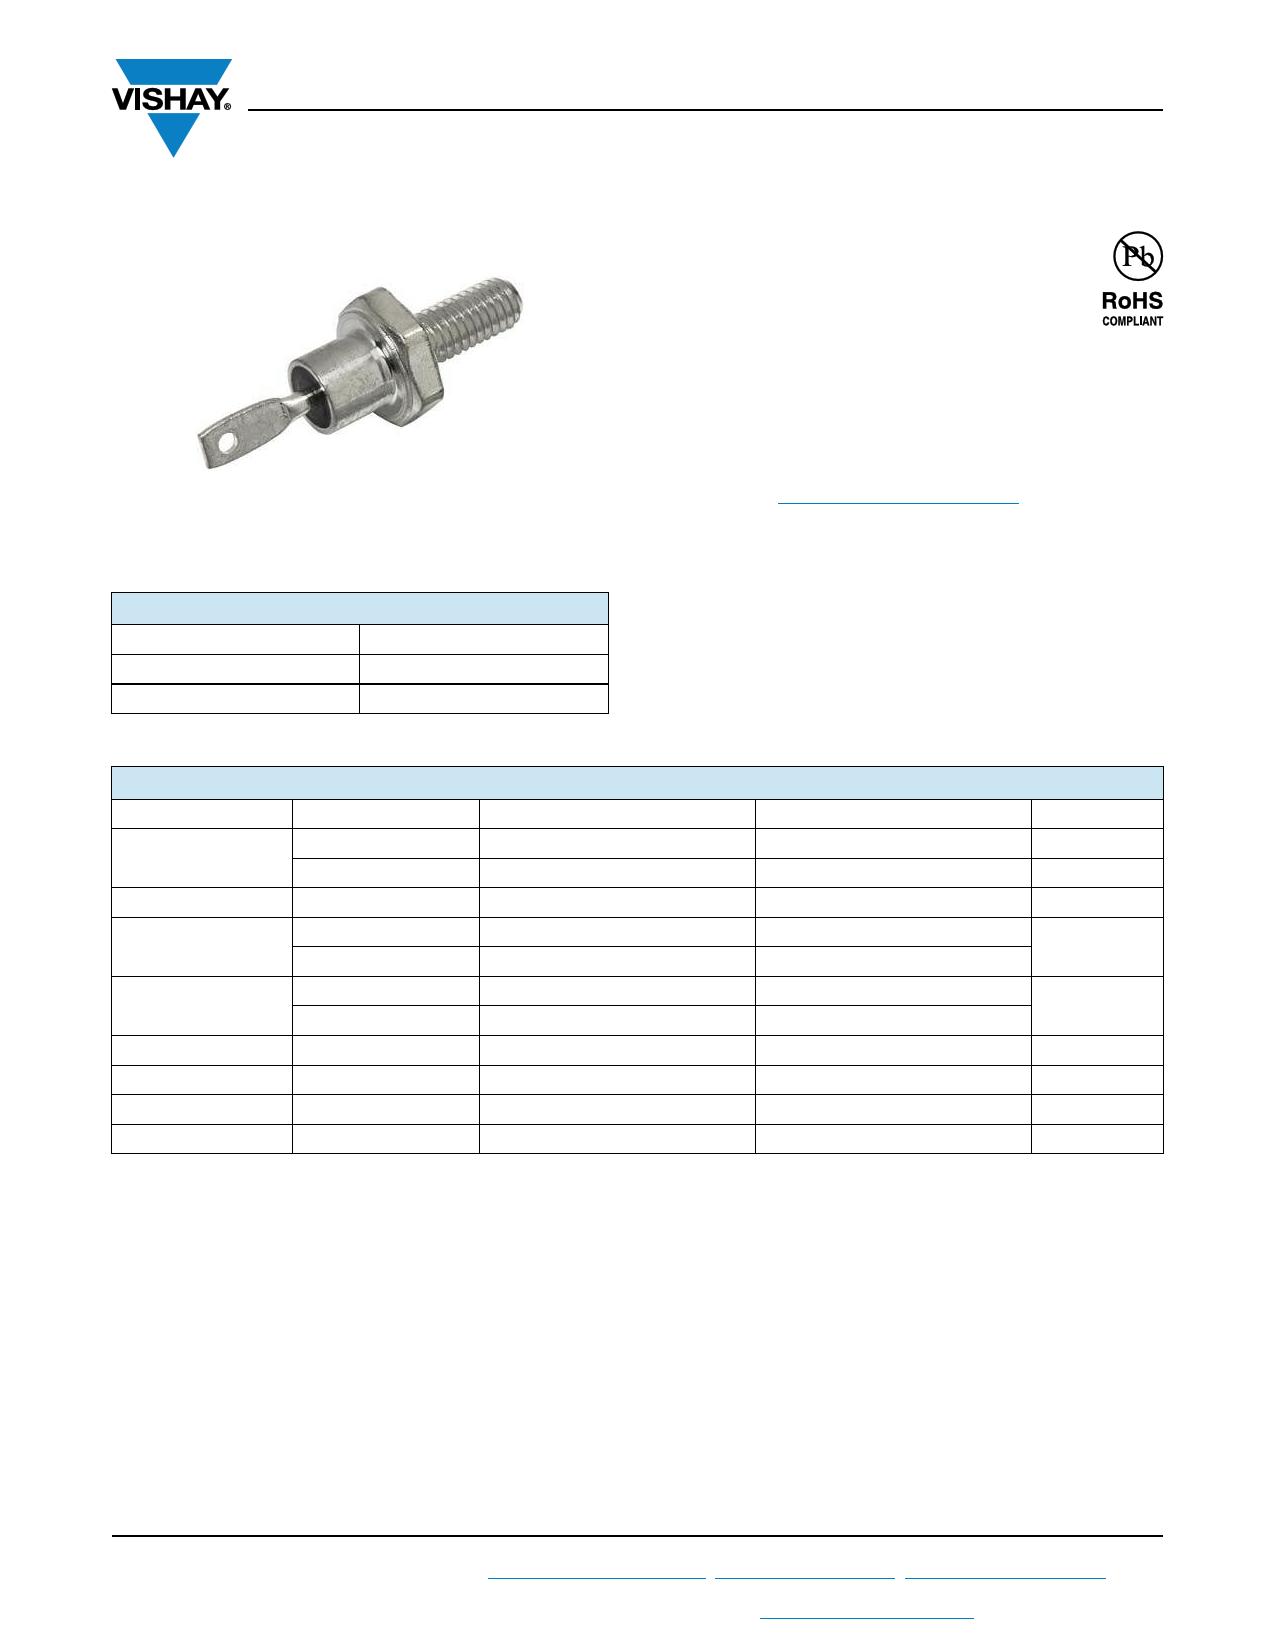 VS-1N3891 datasheet